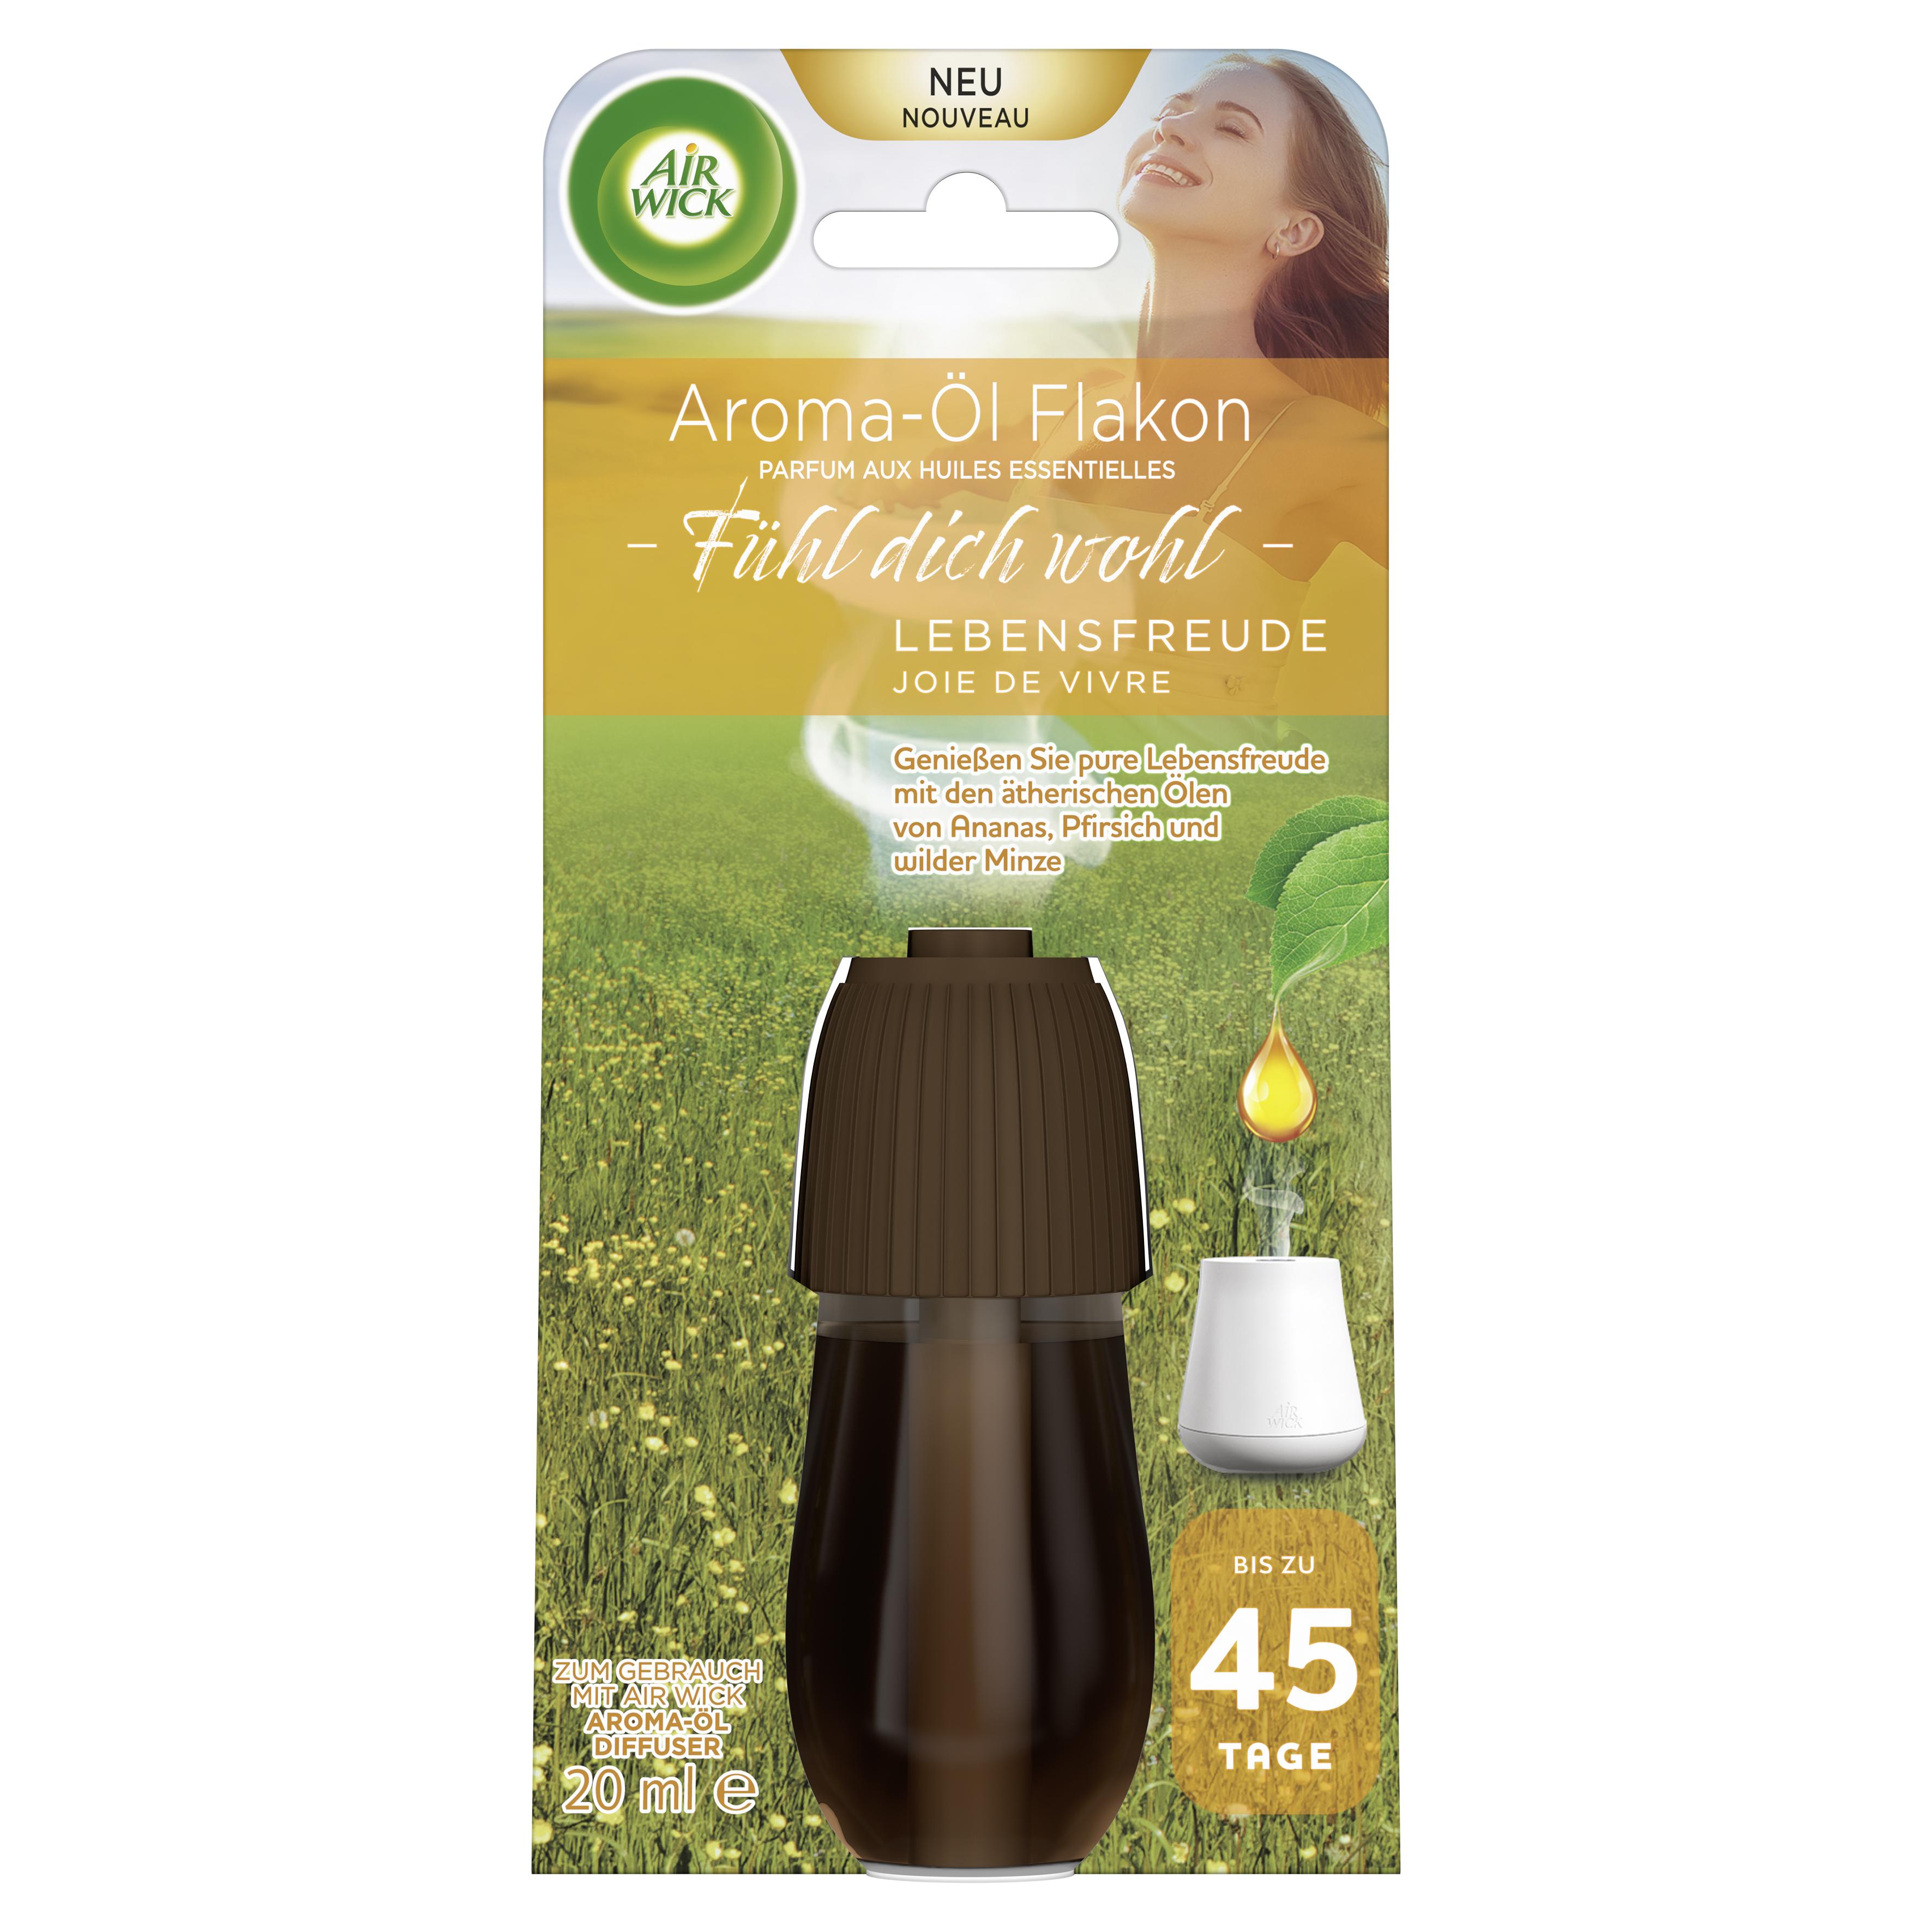 Air Wick Aroma-Öl Flakon Lebensfreude